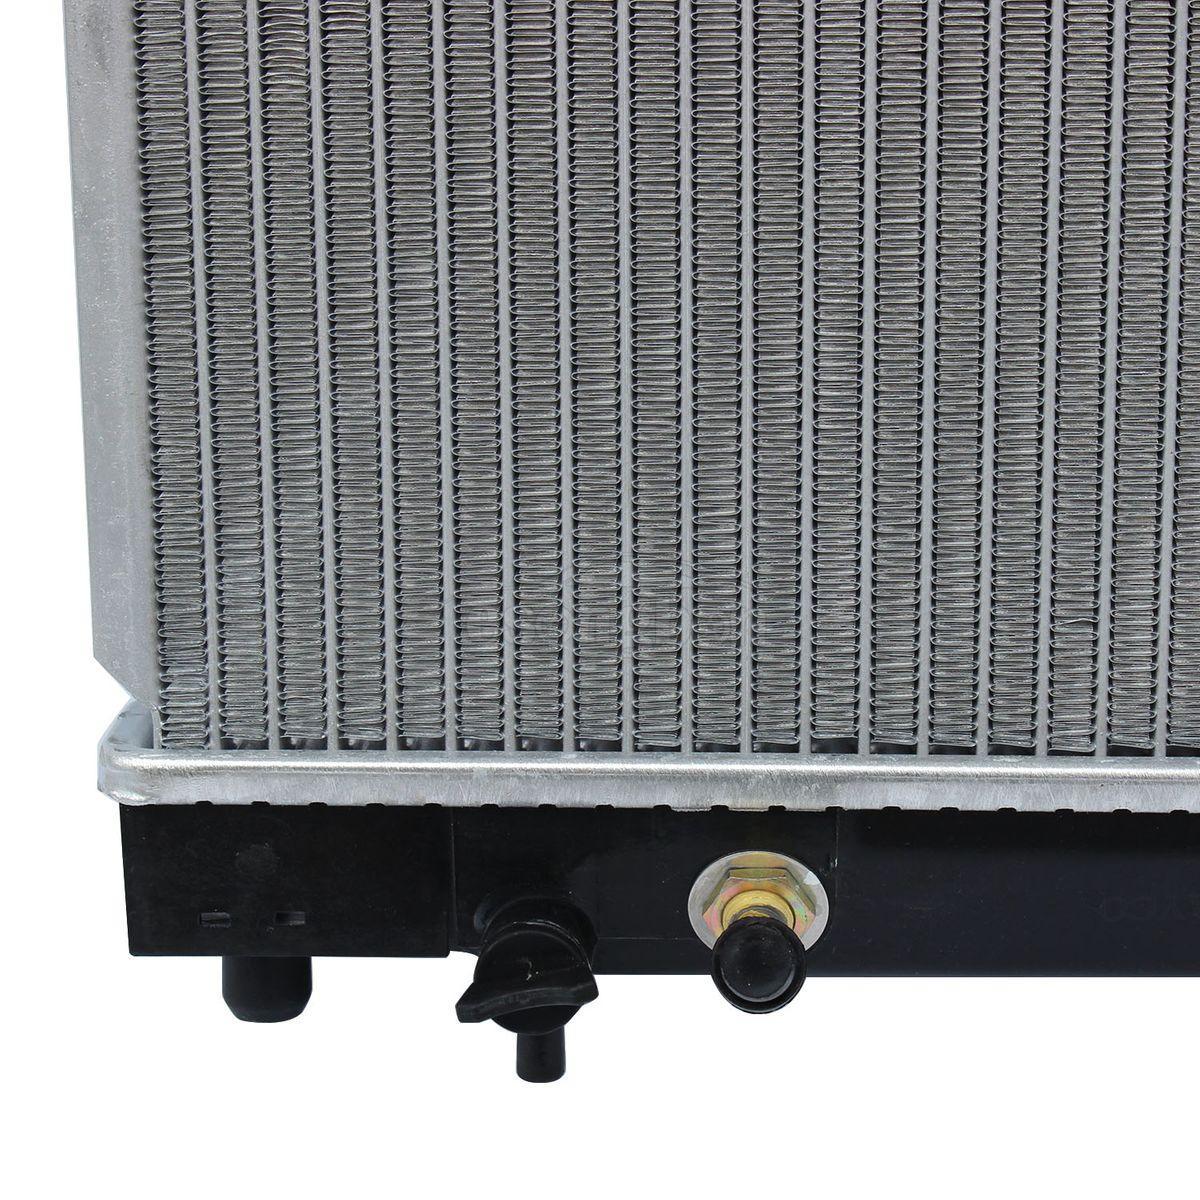 2004 Scion Xb Transmission: Aluminum Radiator 2305 For 2004-2006 SCION XA/XB 1.5L L4